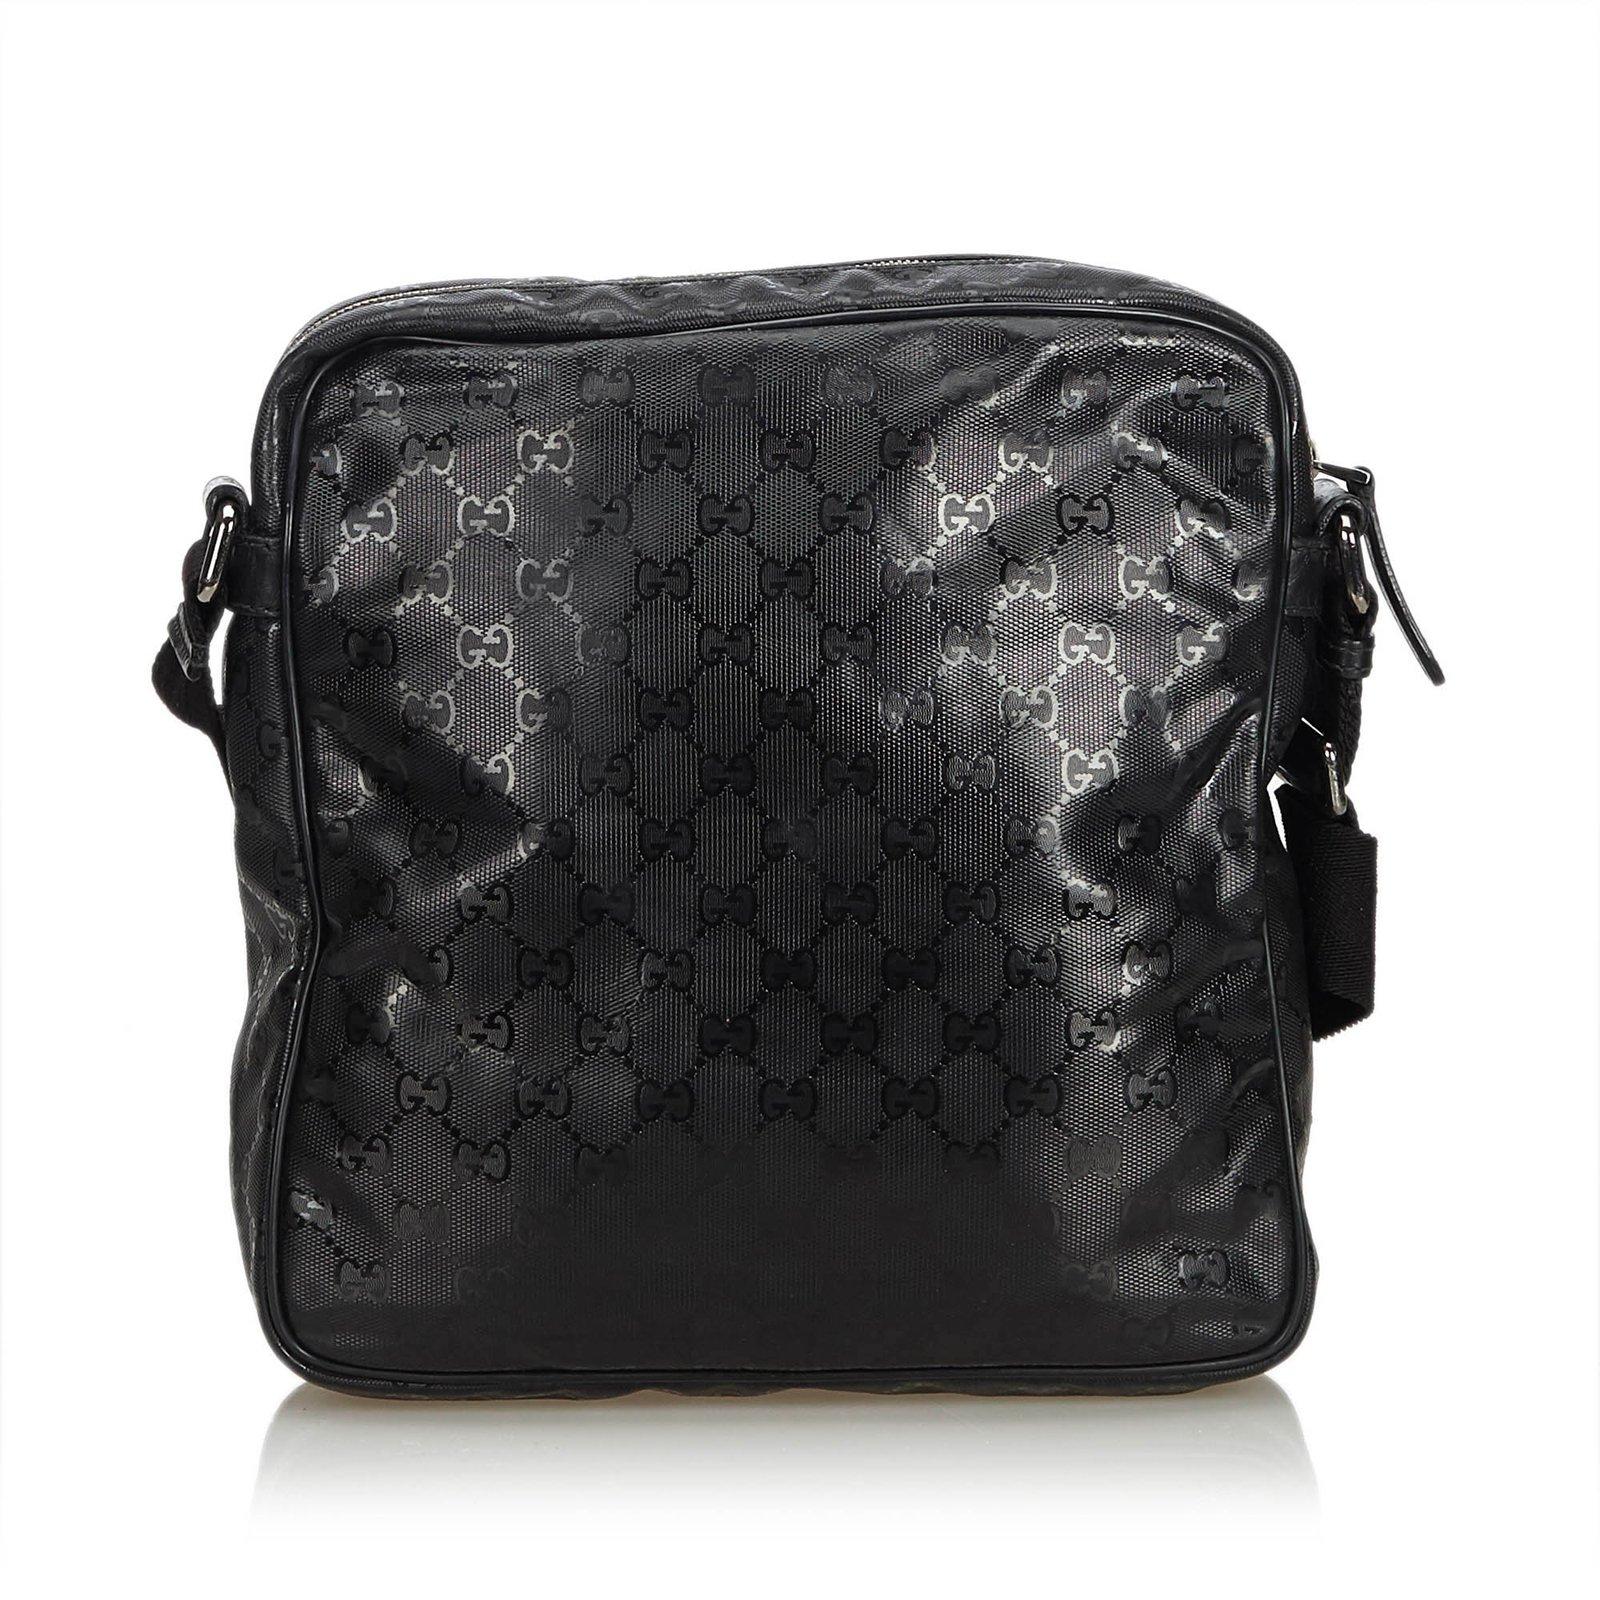 e9b19b36031f Gucci GG Imprime Messenger Bag Handbags Leather,Other,Plastic Black ...